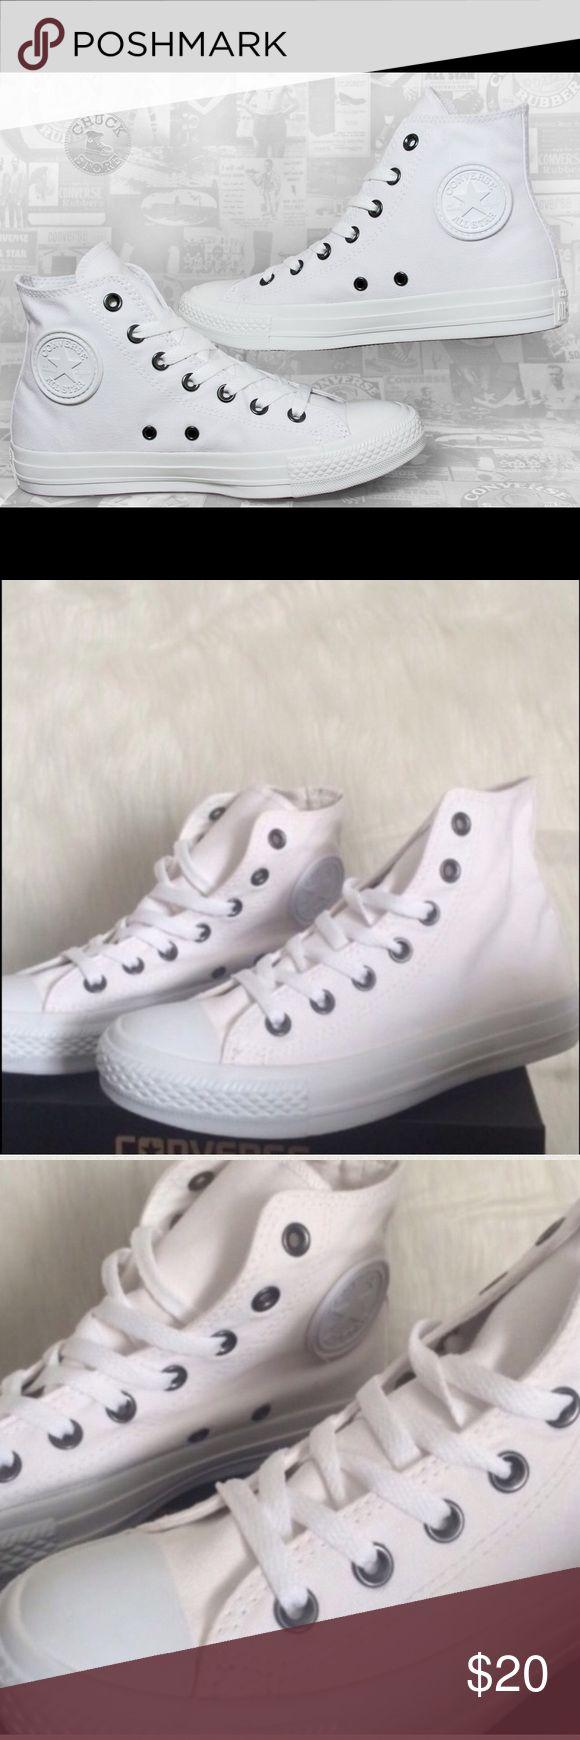 📍FLASH SALE📍CONVERSE WHITE WOMENS MONOCHROME WOMENS Converse Shoes Sneakers